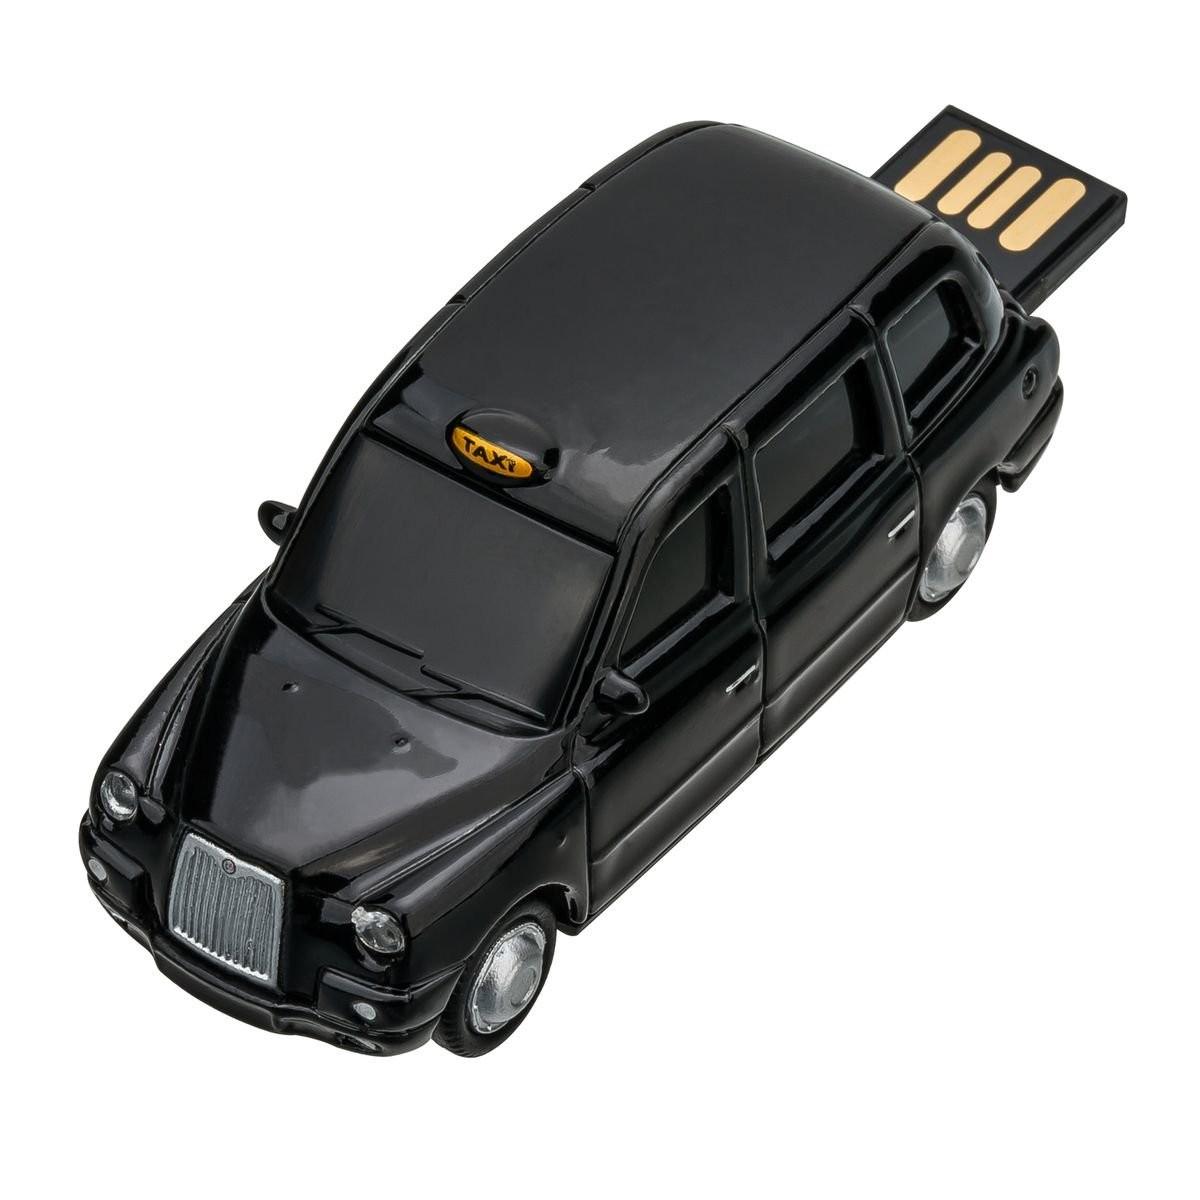 USB-Speicherstick London Taxi TX4 1:72 BLACK 16GB, Ansicht 10